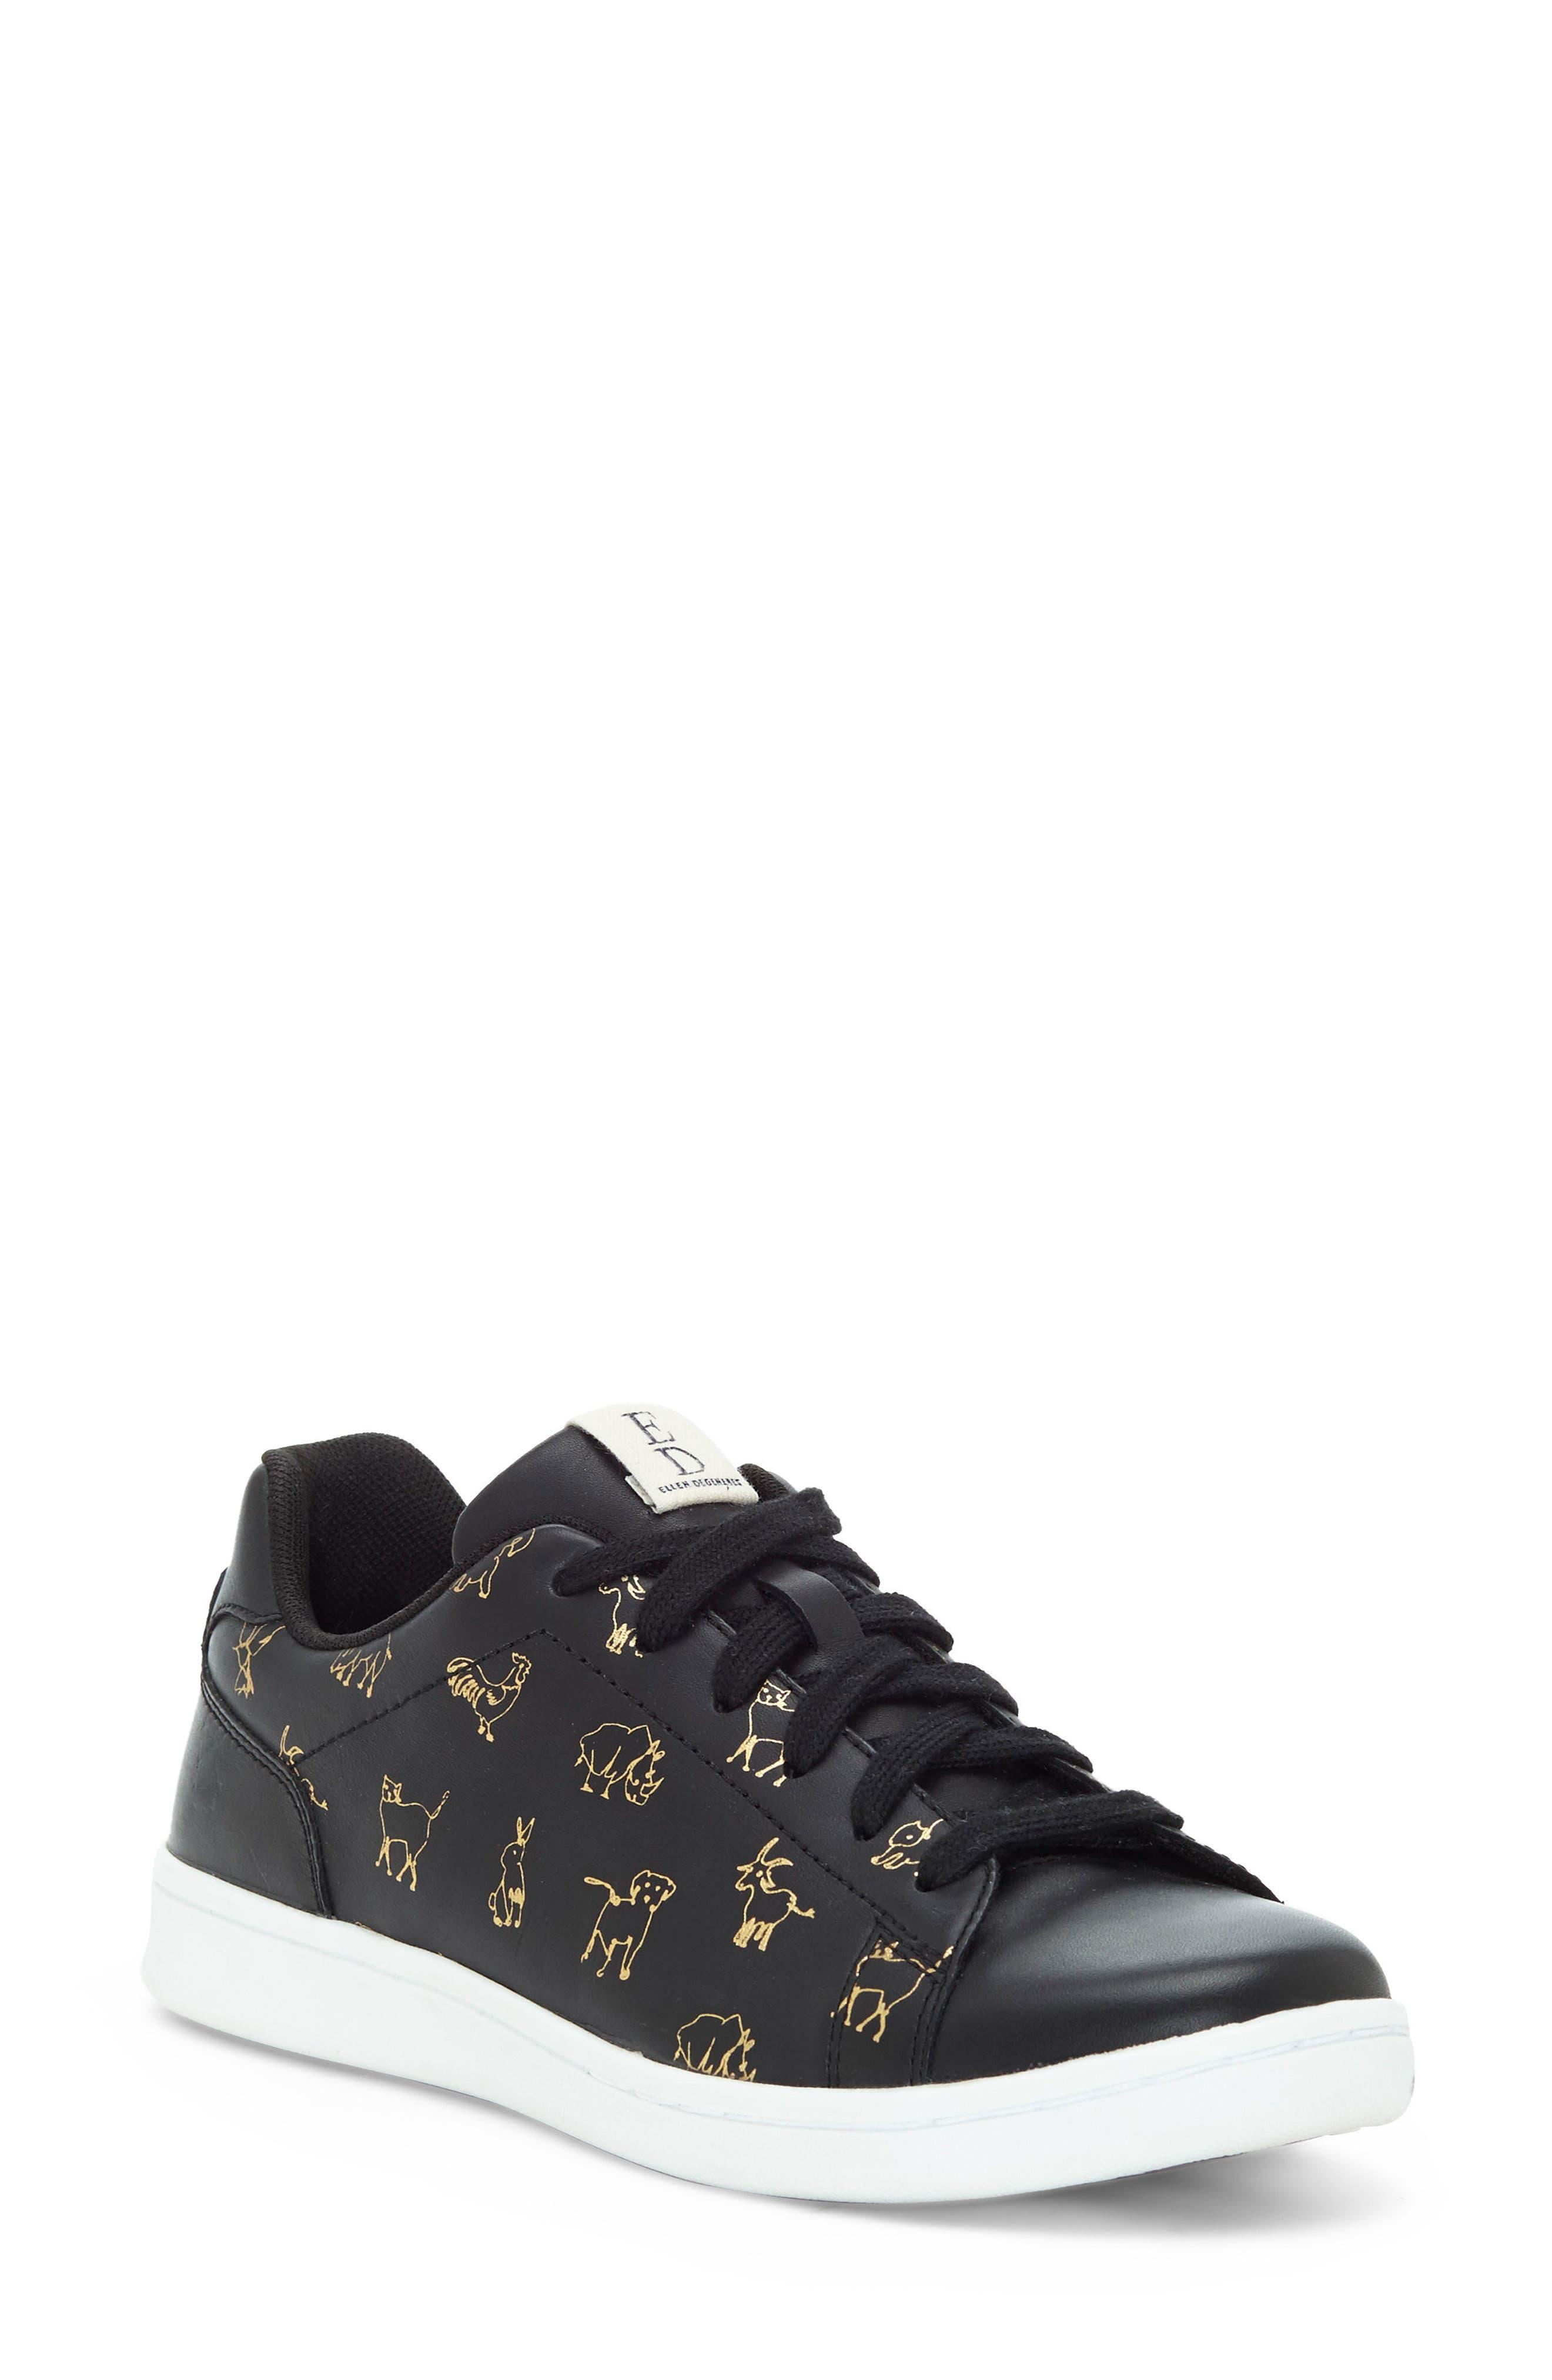 Chaboss Sneaker,                             Main thumbnail 1, color,                             002